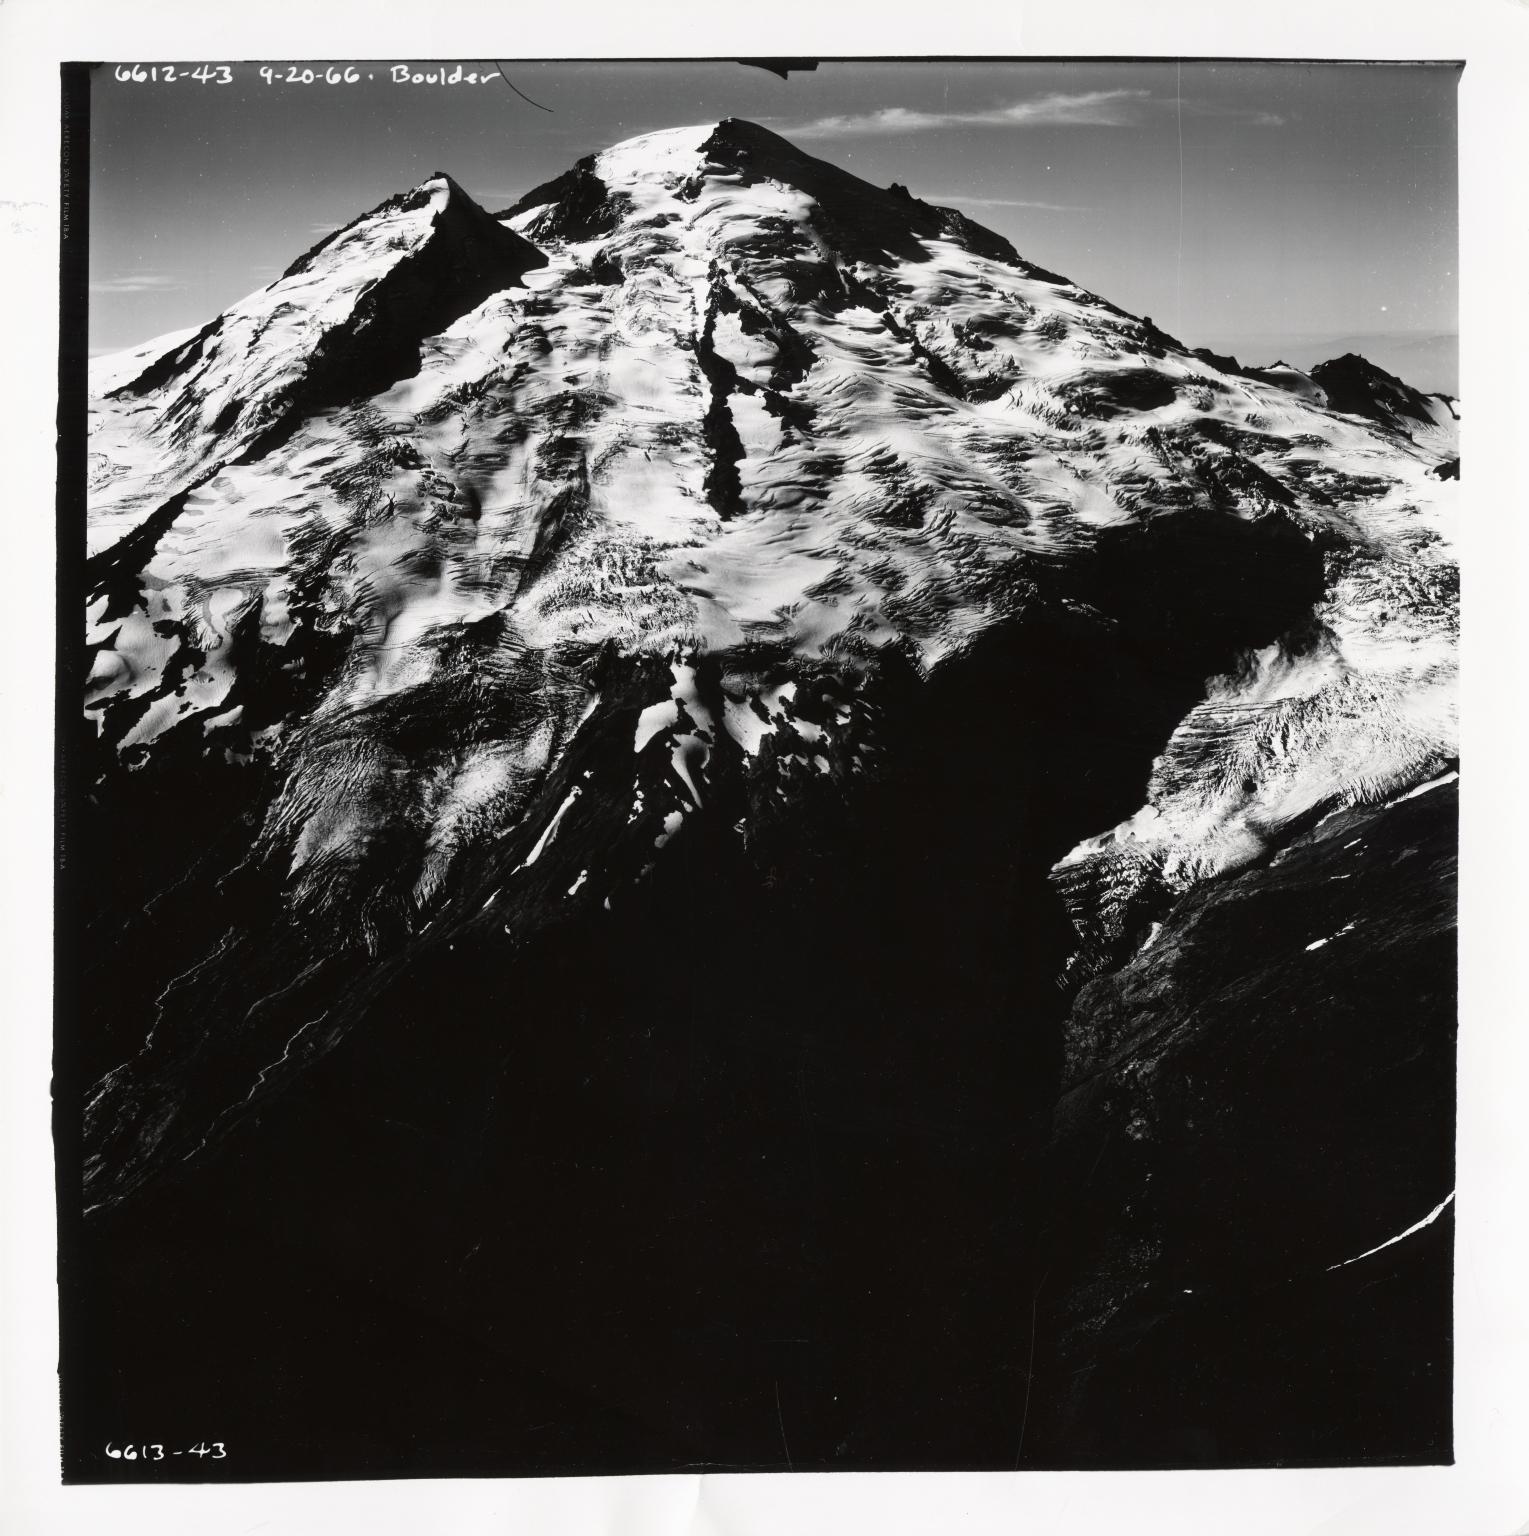 Boulder Glacier, Washington, United States